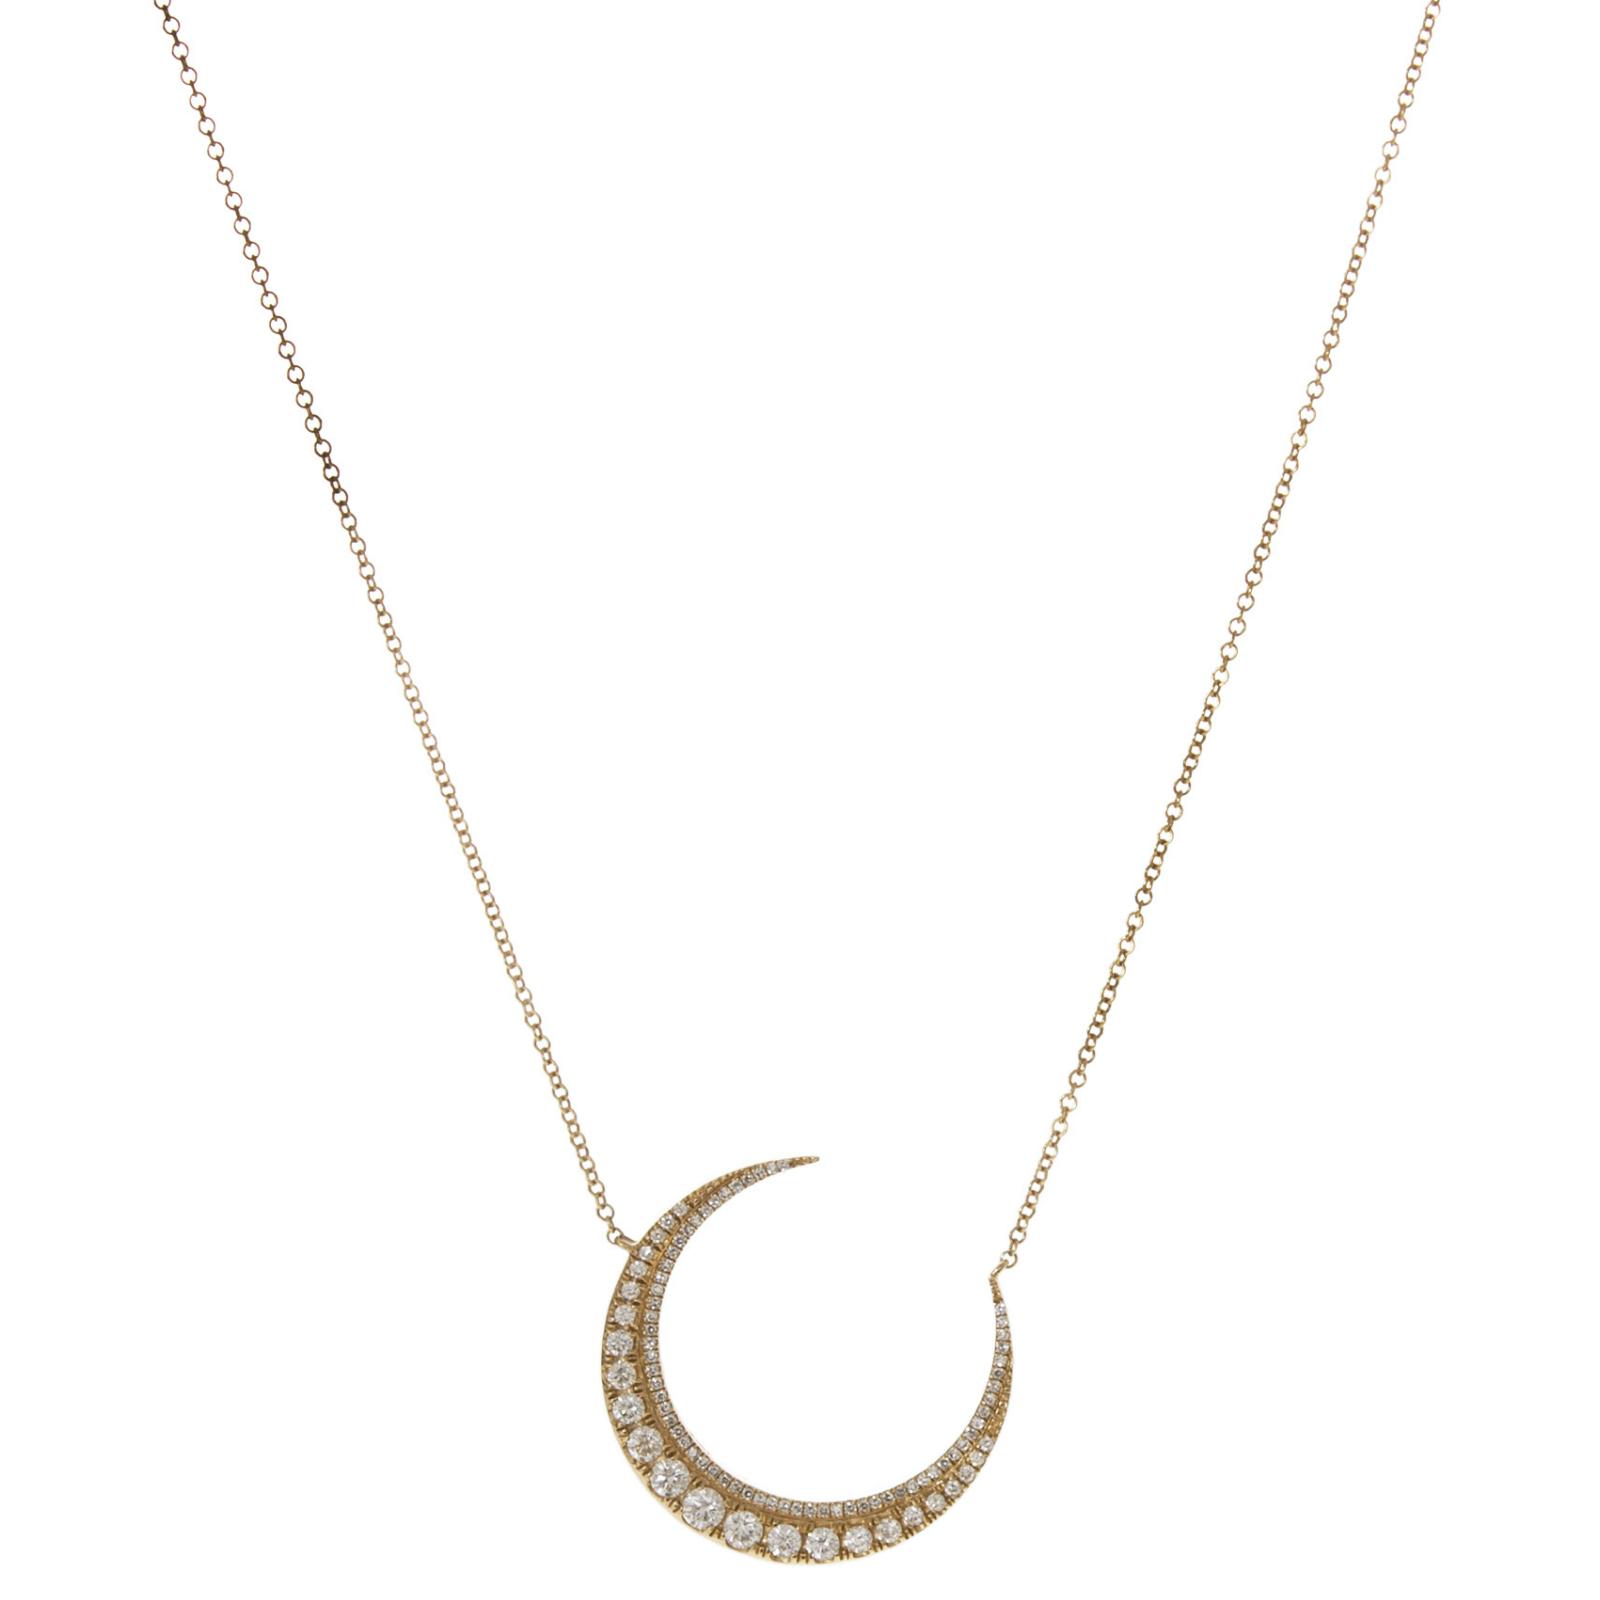 Crecent Moon Necklace